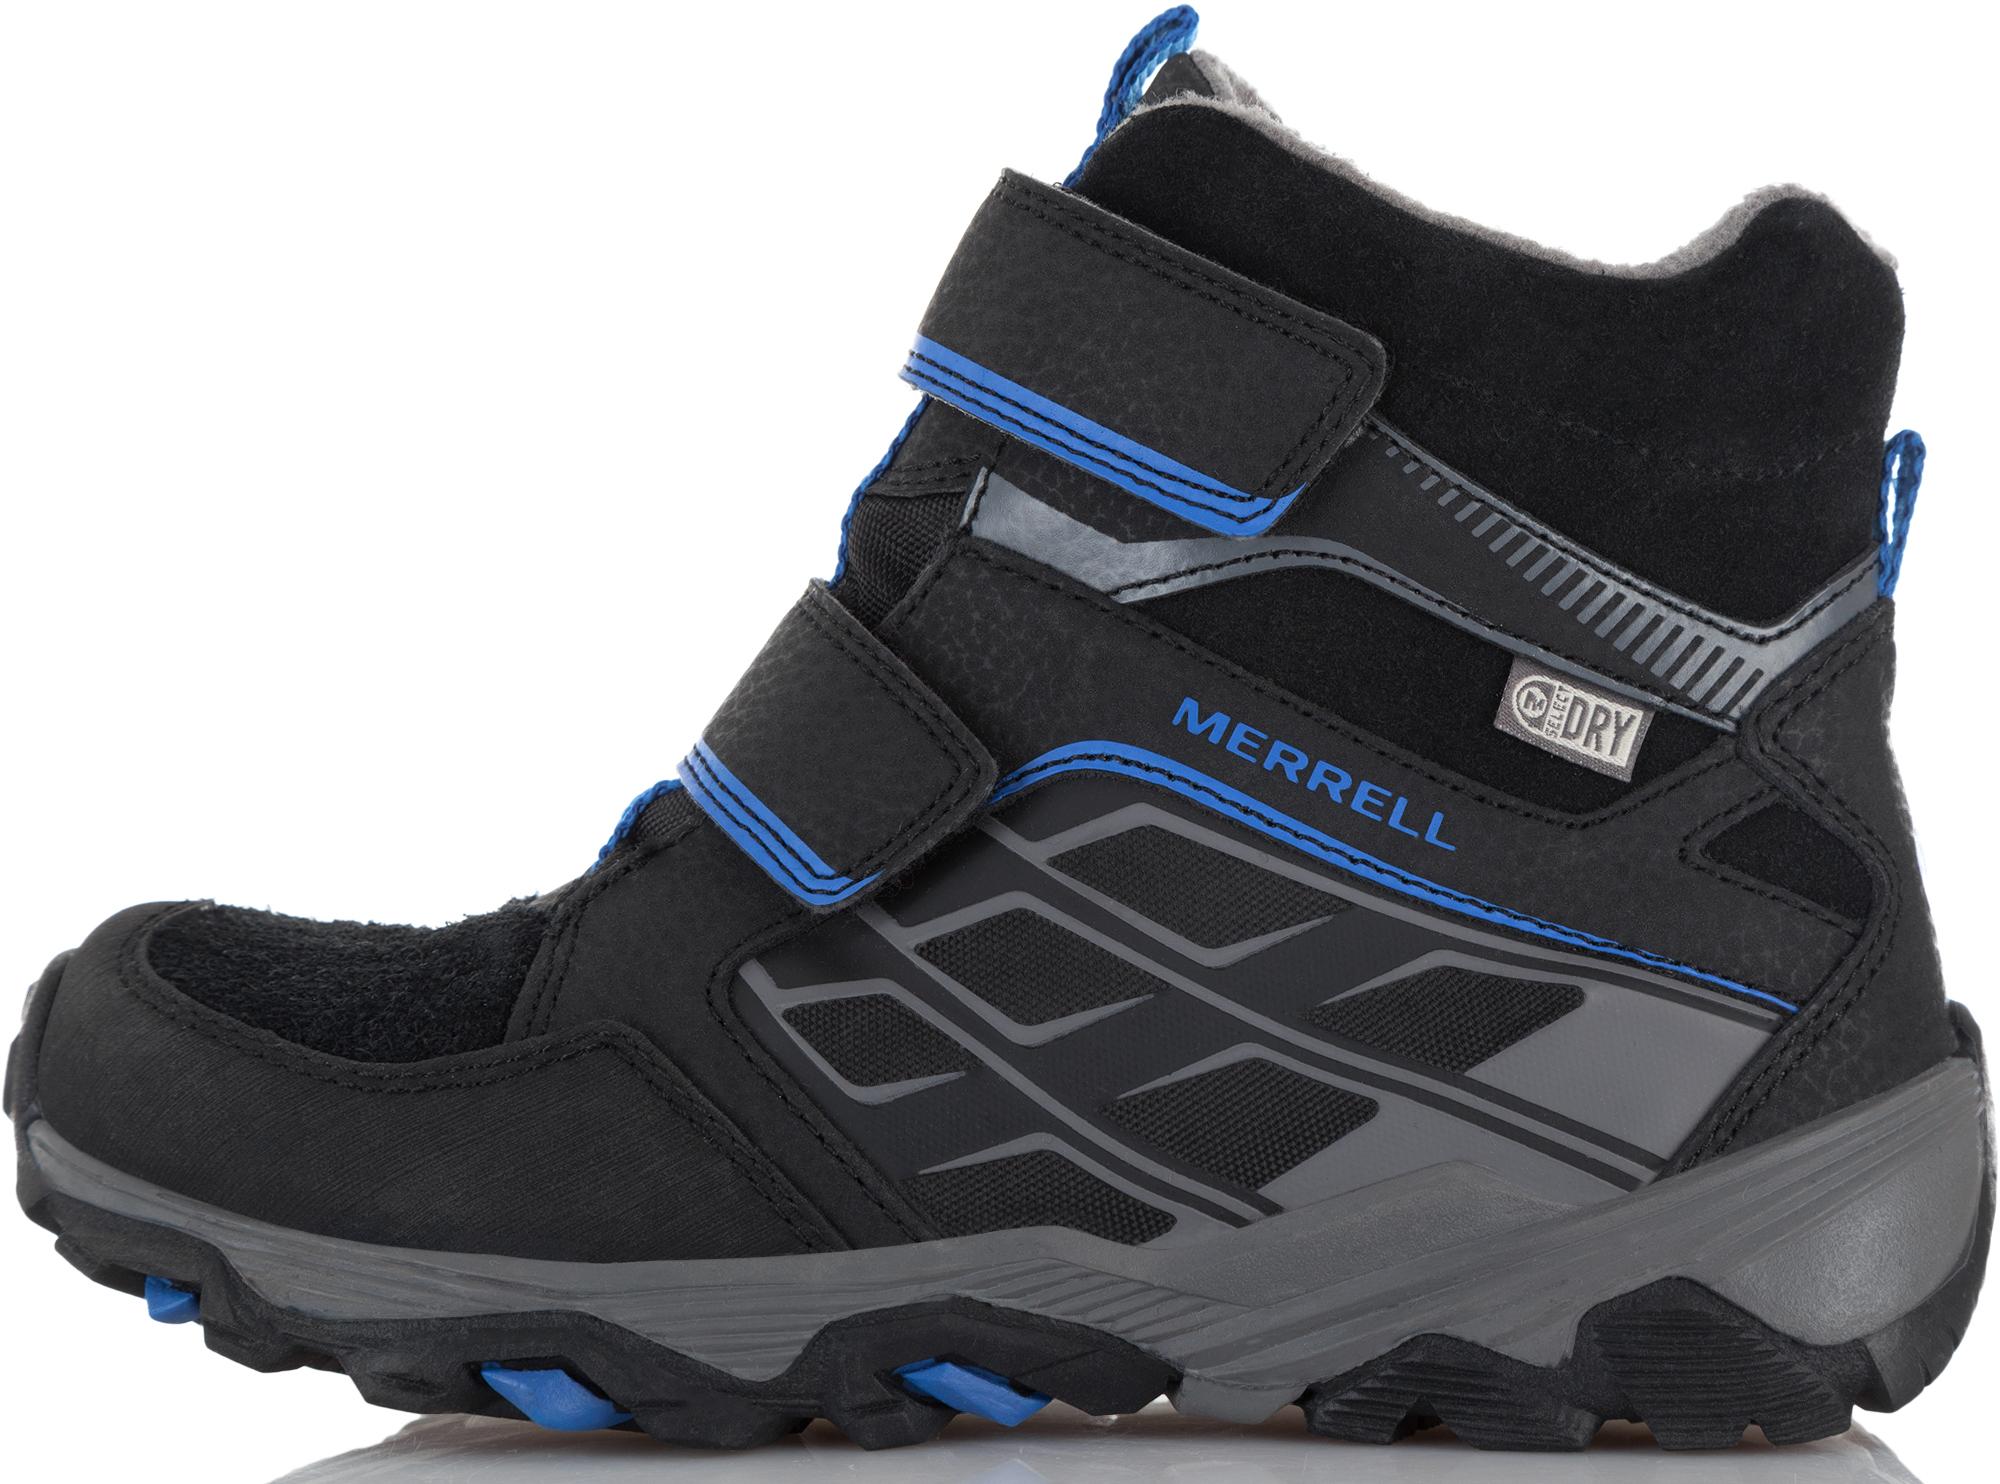 Merrell Ботинки утепленные для мальчиков Merrell Moab, размер 40,5 цены онлайн